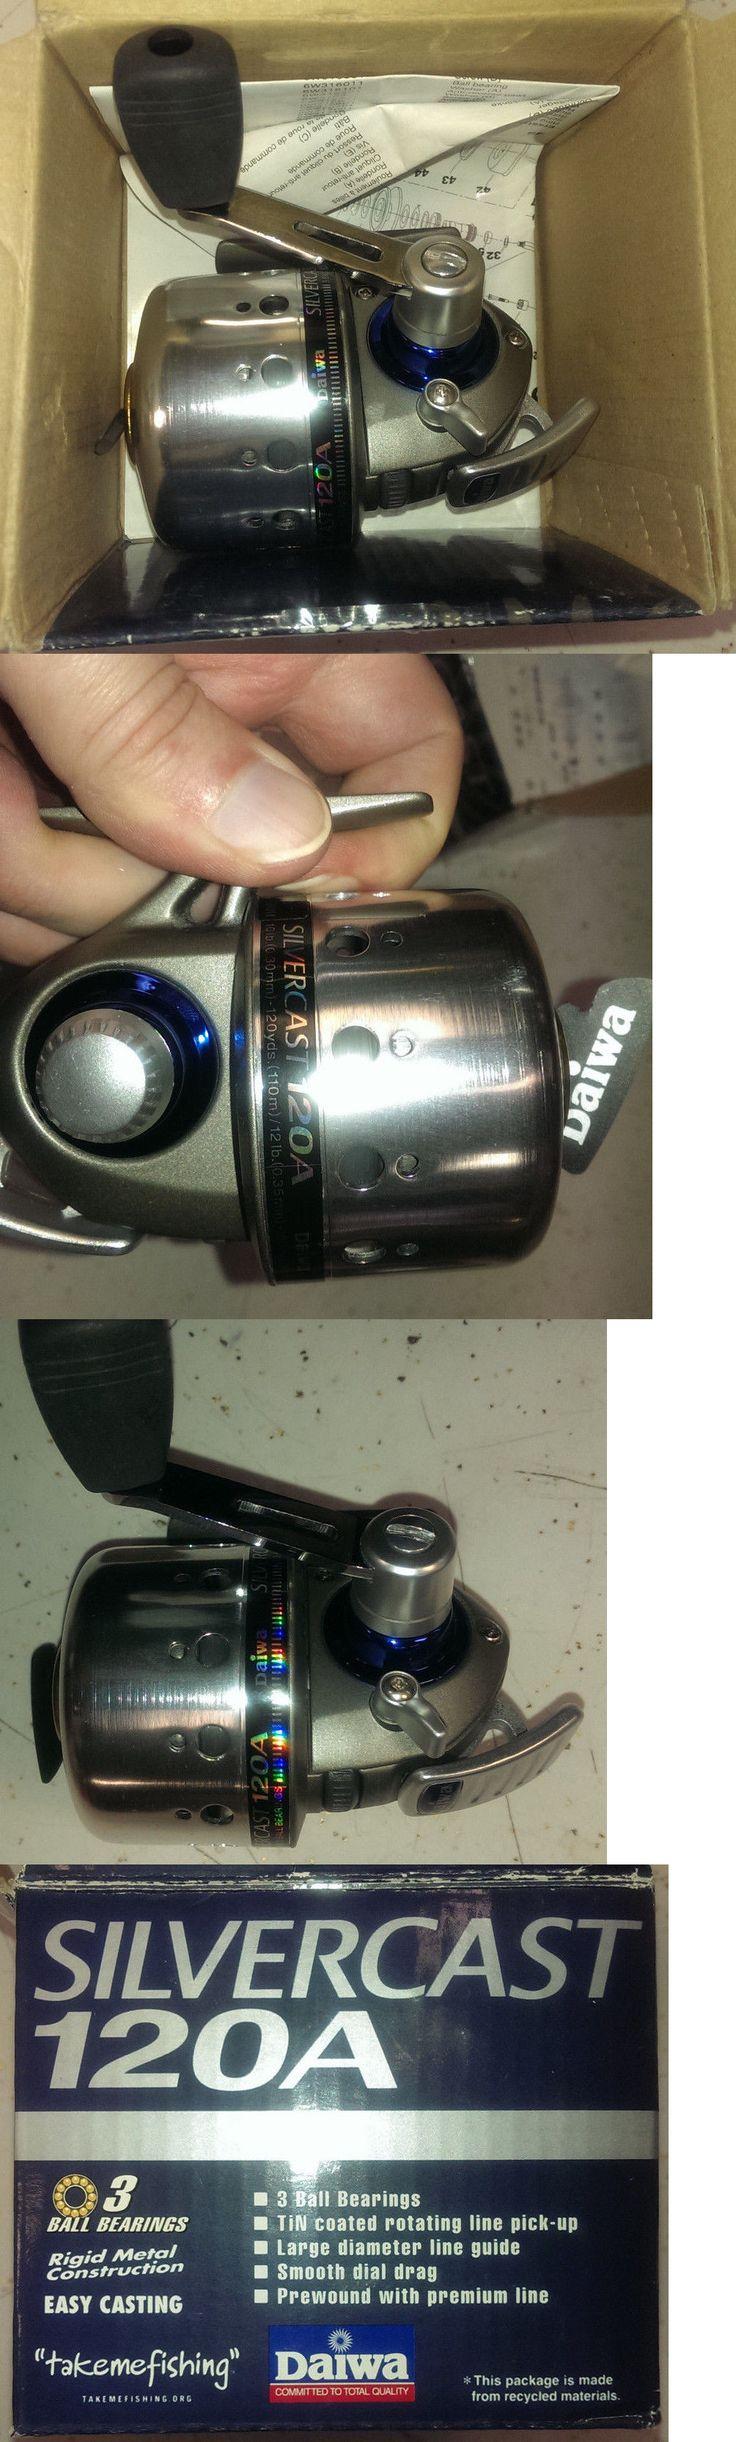 Spincasting Reels 108154: Daiwa Silvercast 120A Series Spincast Reel Fishing Reel 3 Bb 4.3:1 Gr -> BUY IT NOW ONLY: $32.22 on eBay!